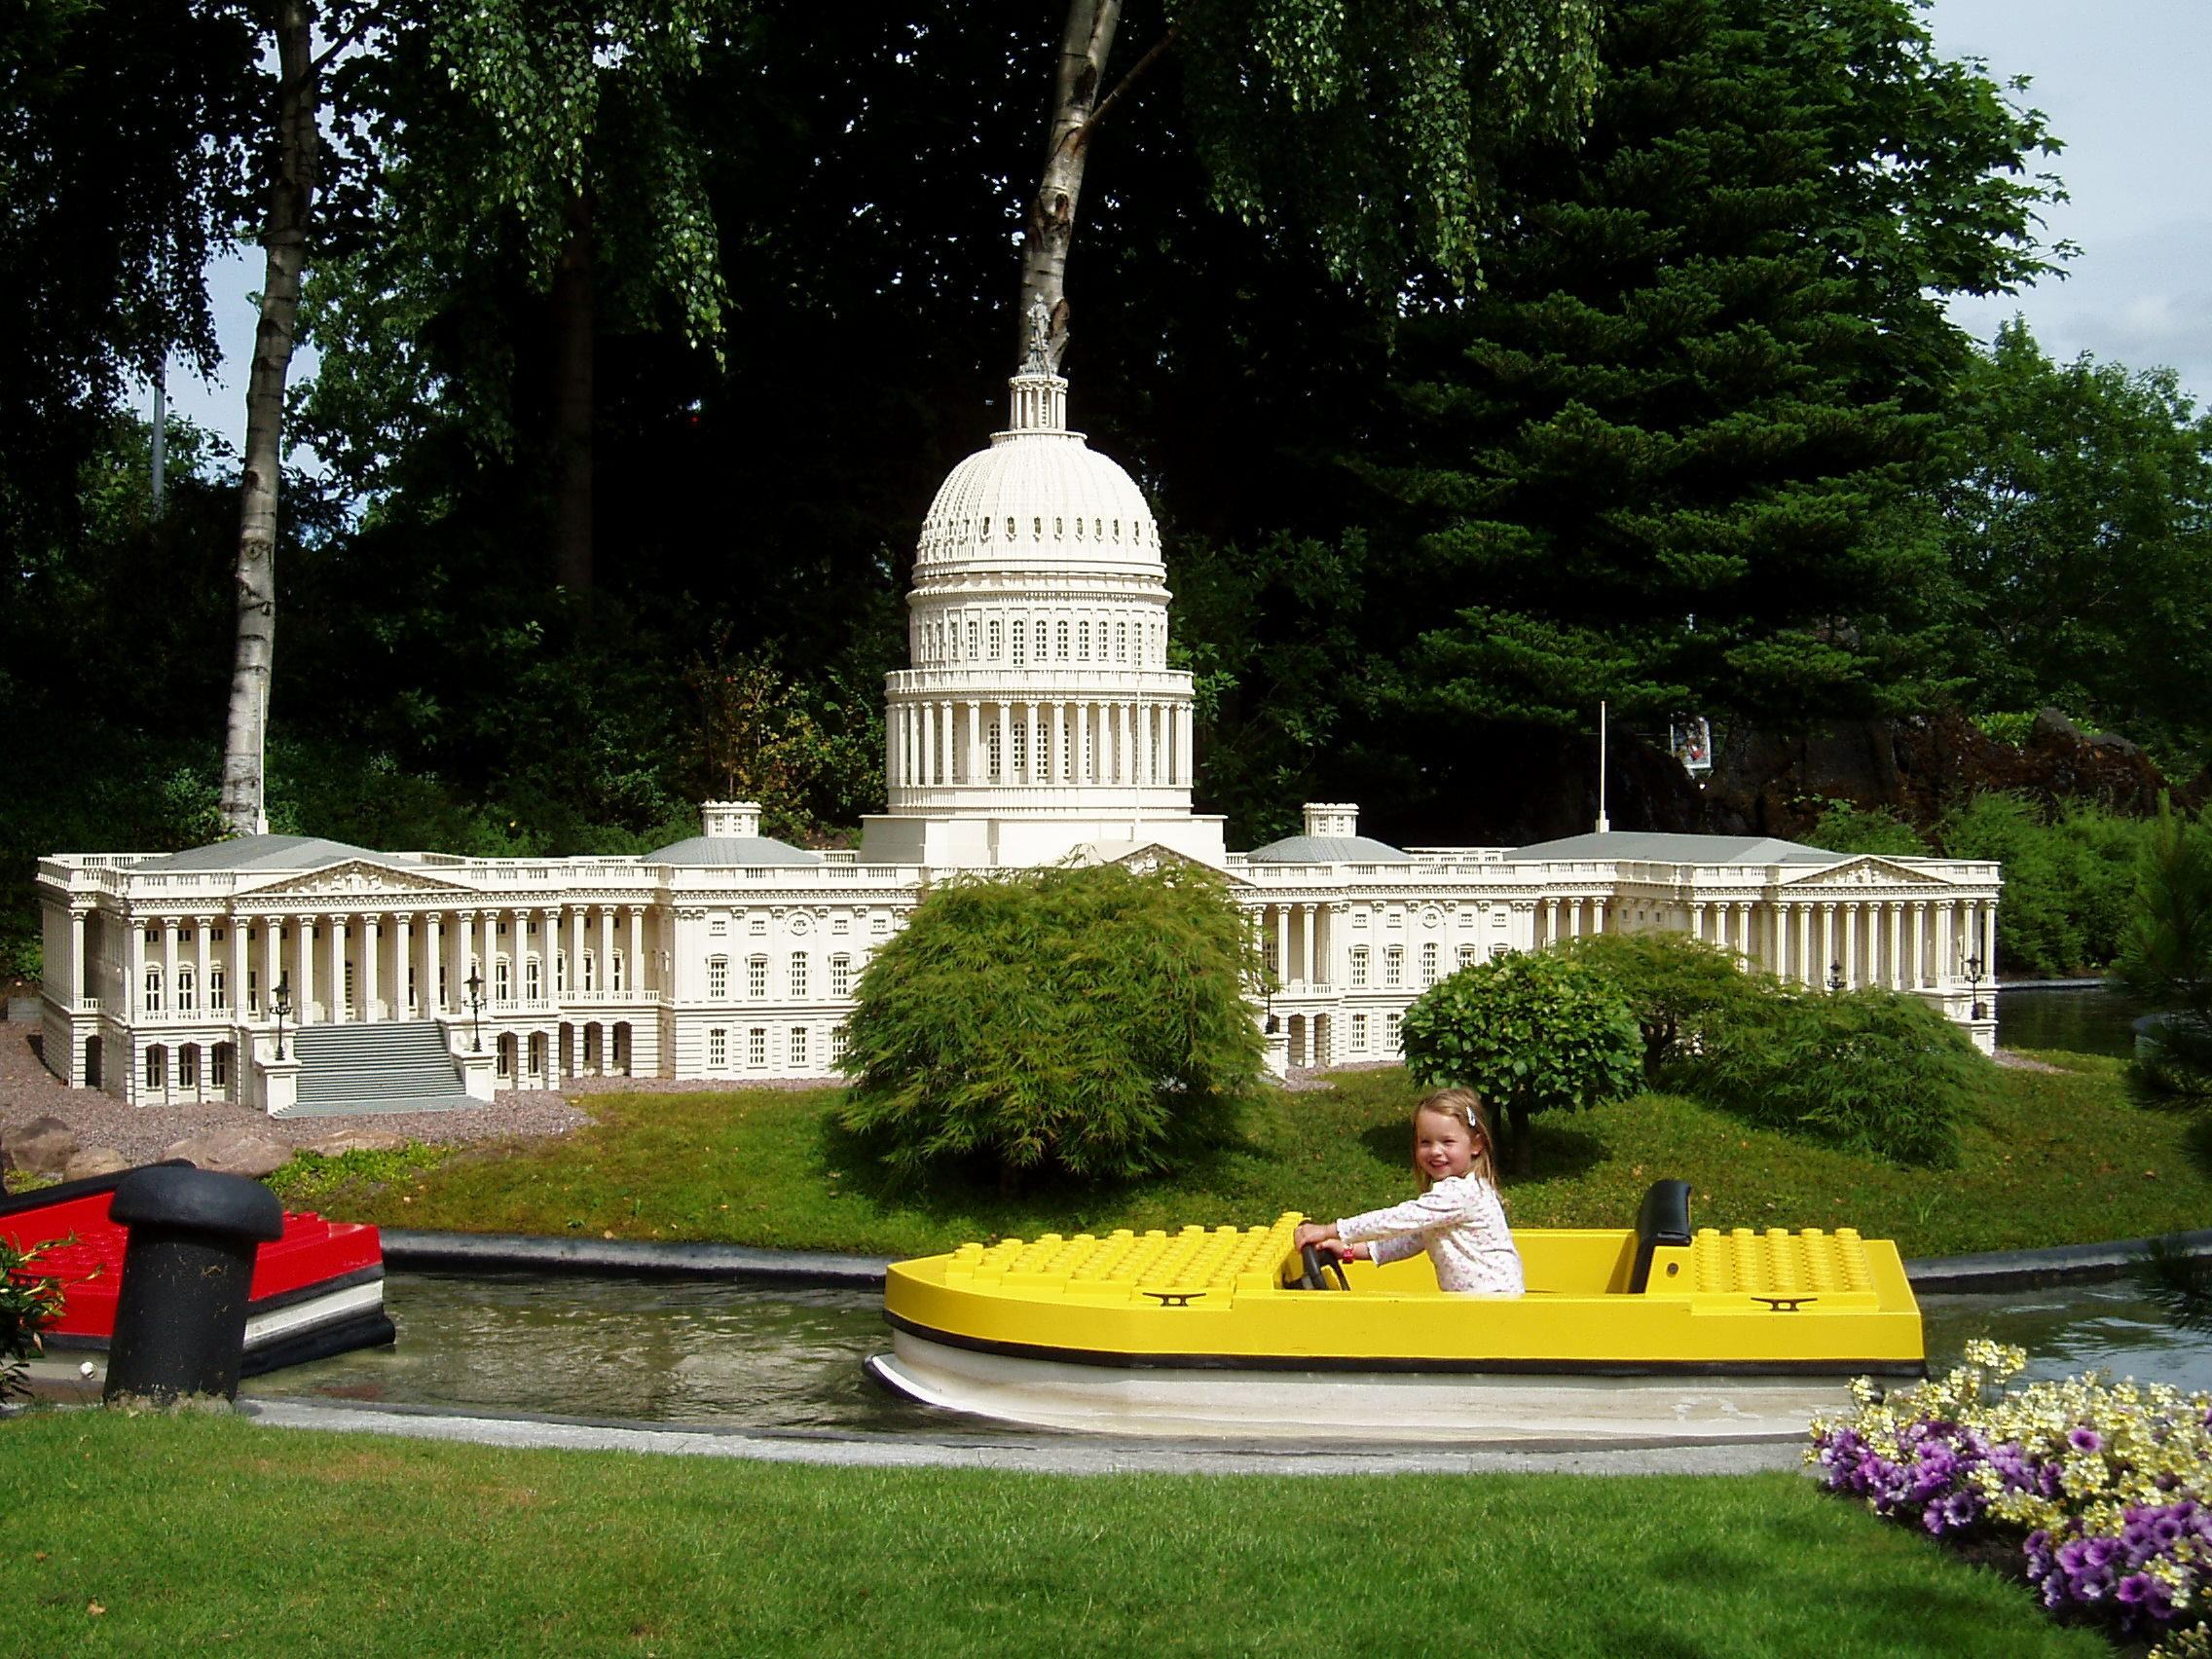 Legoland, Denmark - Lego Photo (3418999) - Fanpop